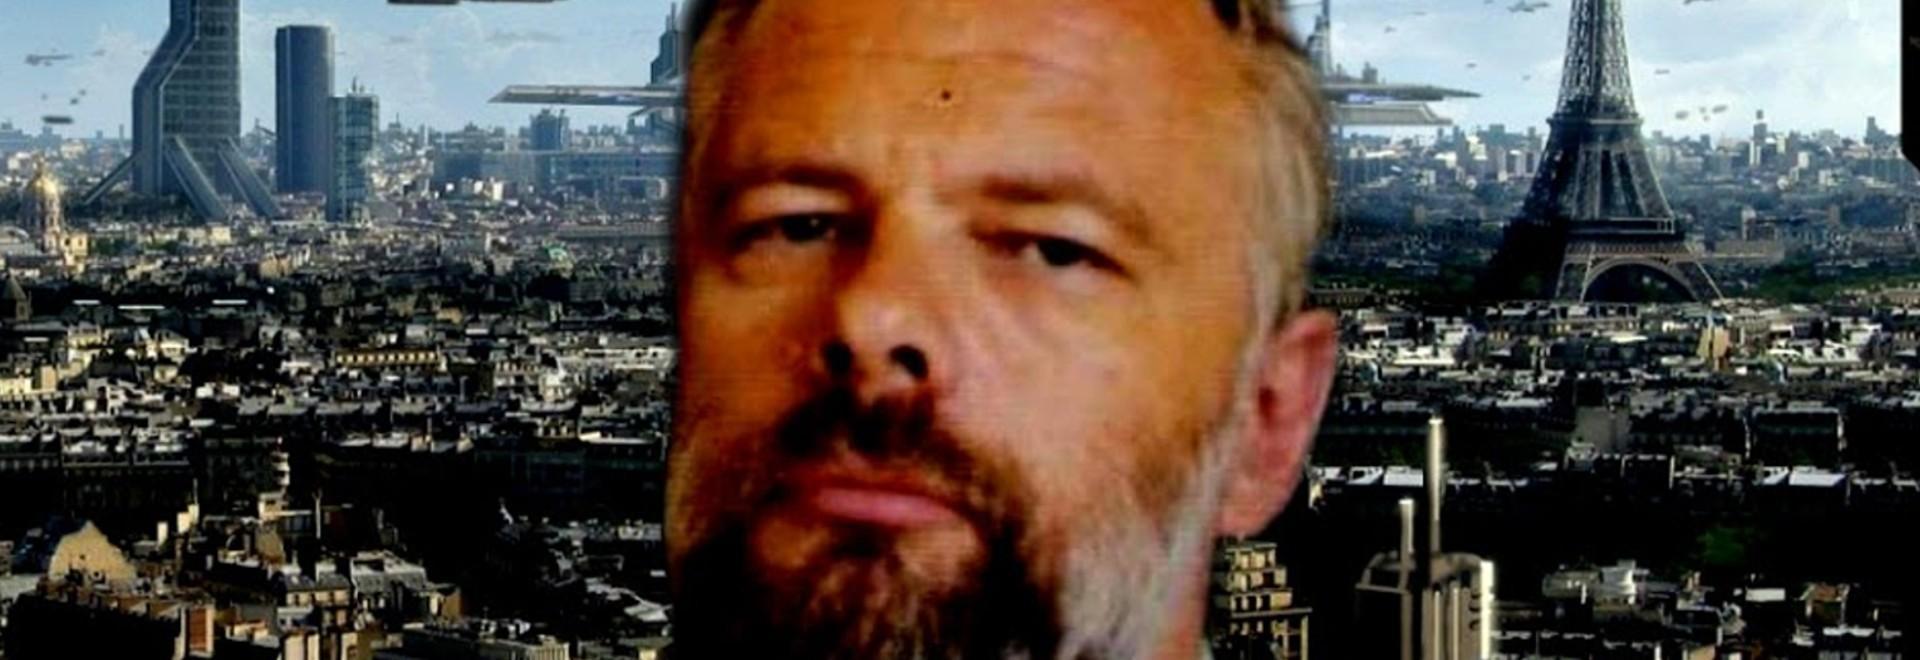 Philip Dick - Fantascienza e pseudomondi